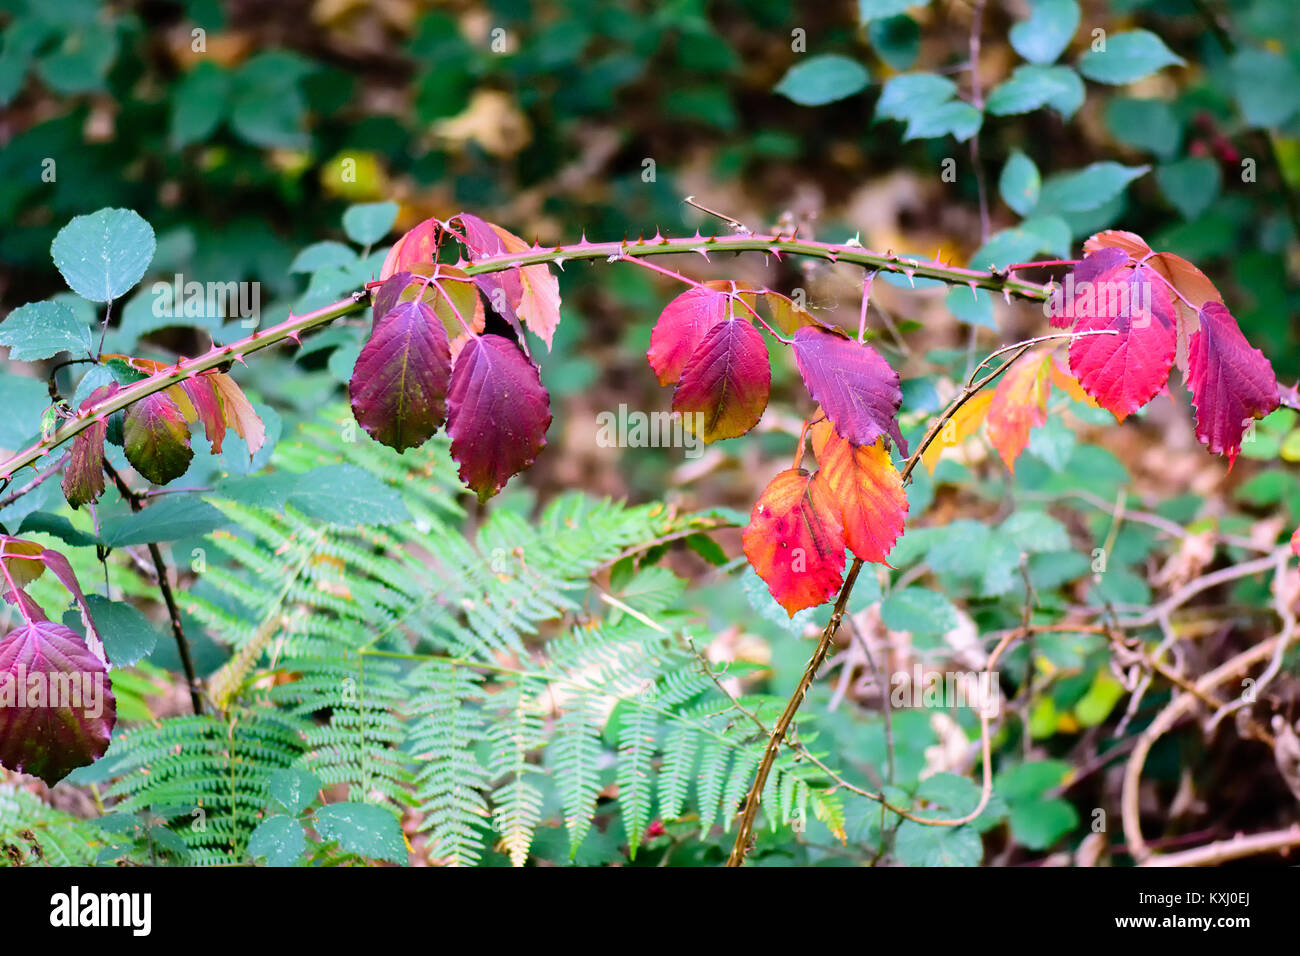 Violet Yellow Leaves Stockfotos & Violet Yellow Leaves Bilder - Alamy